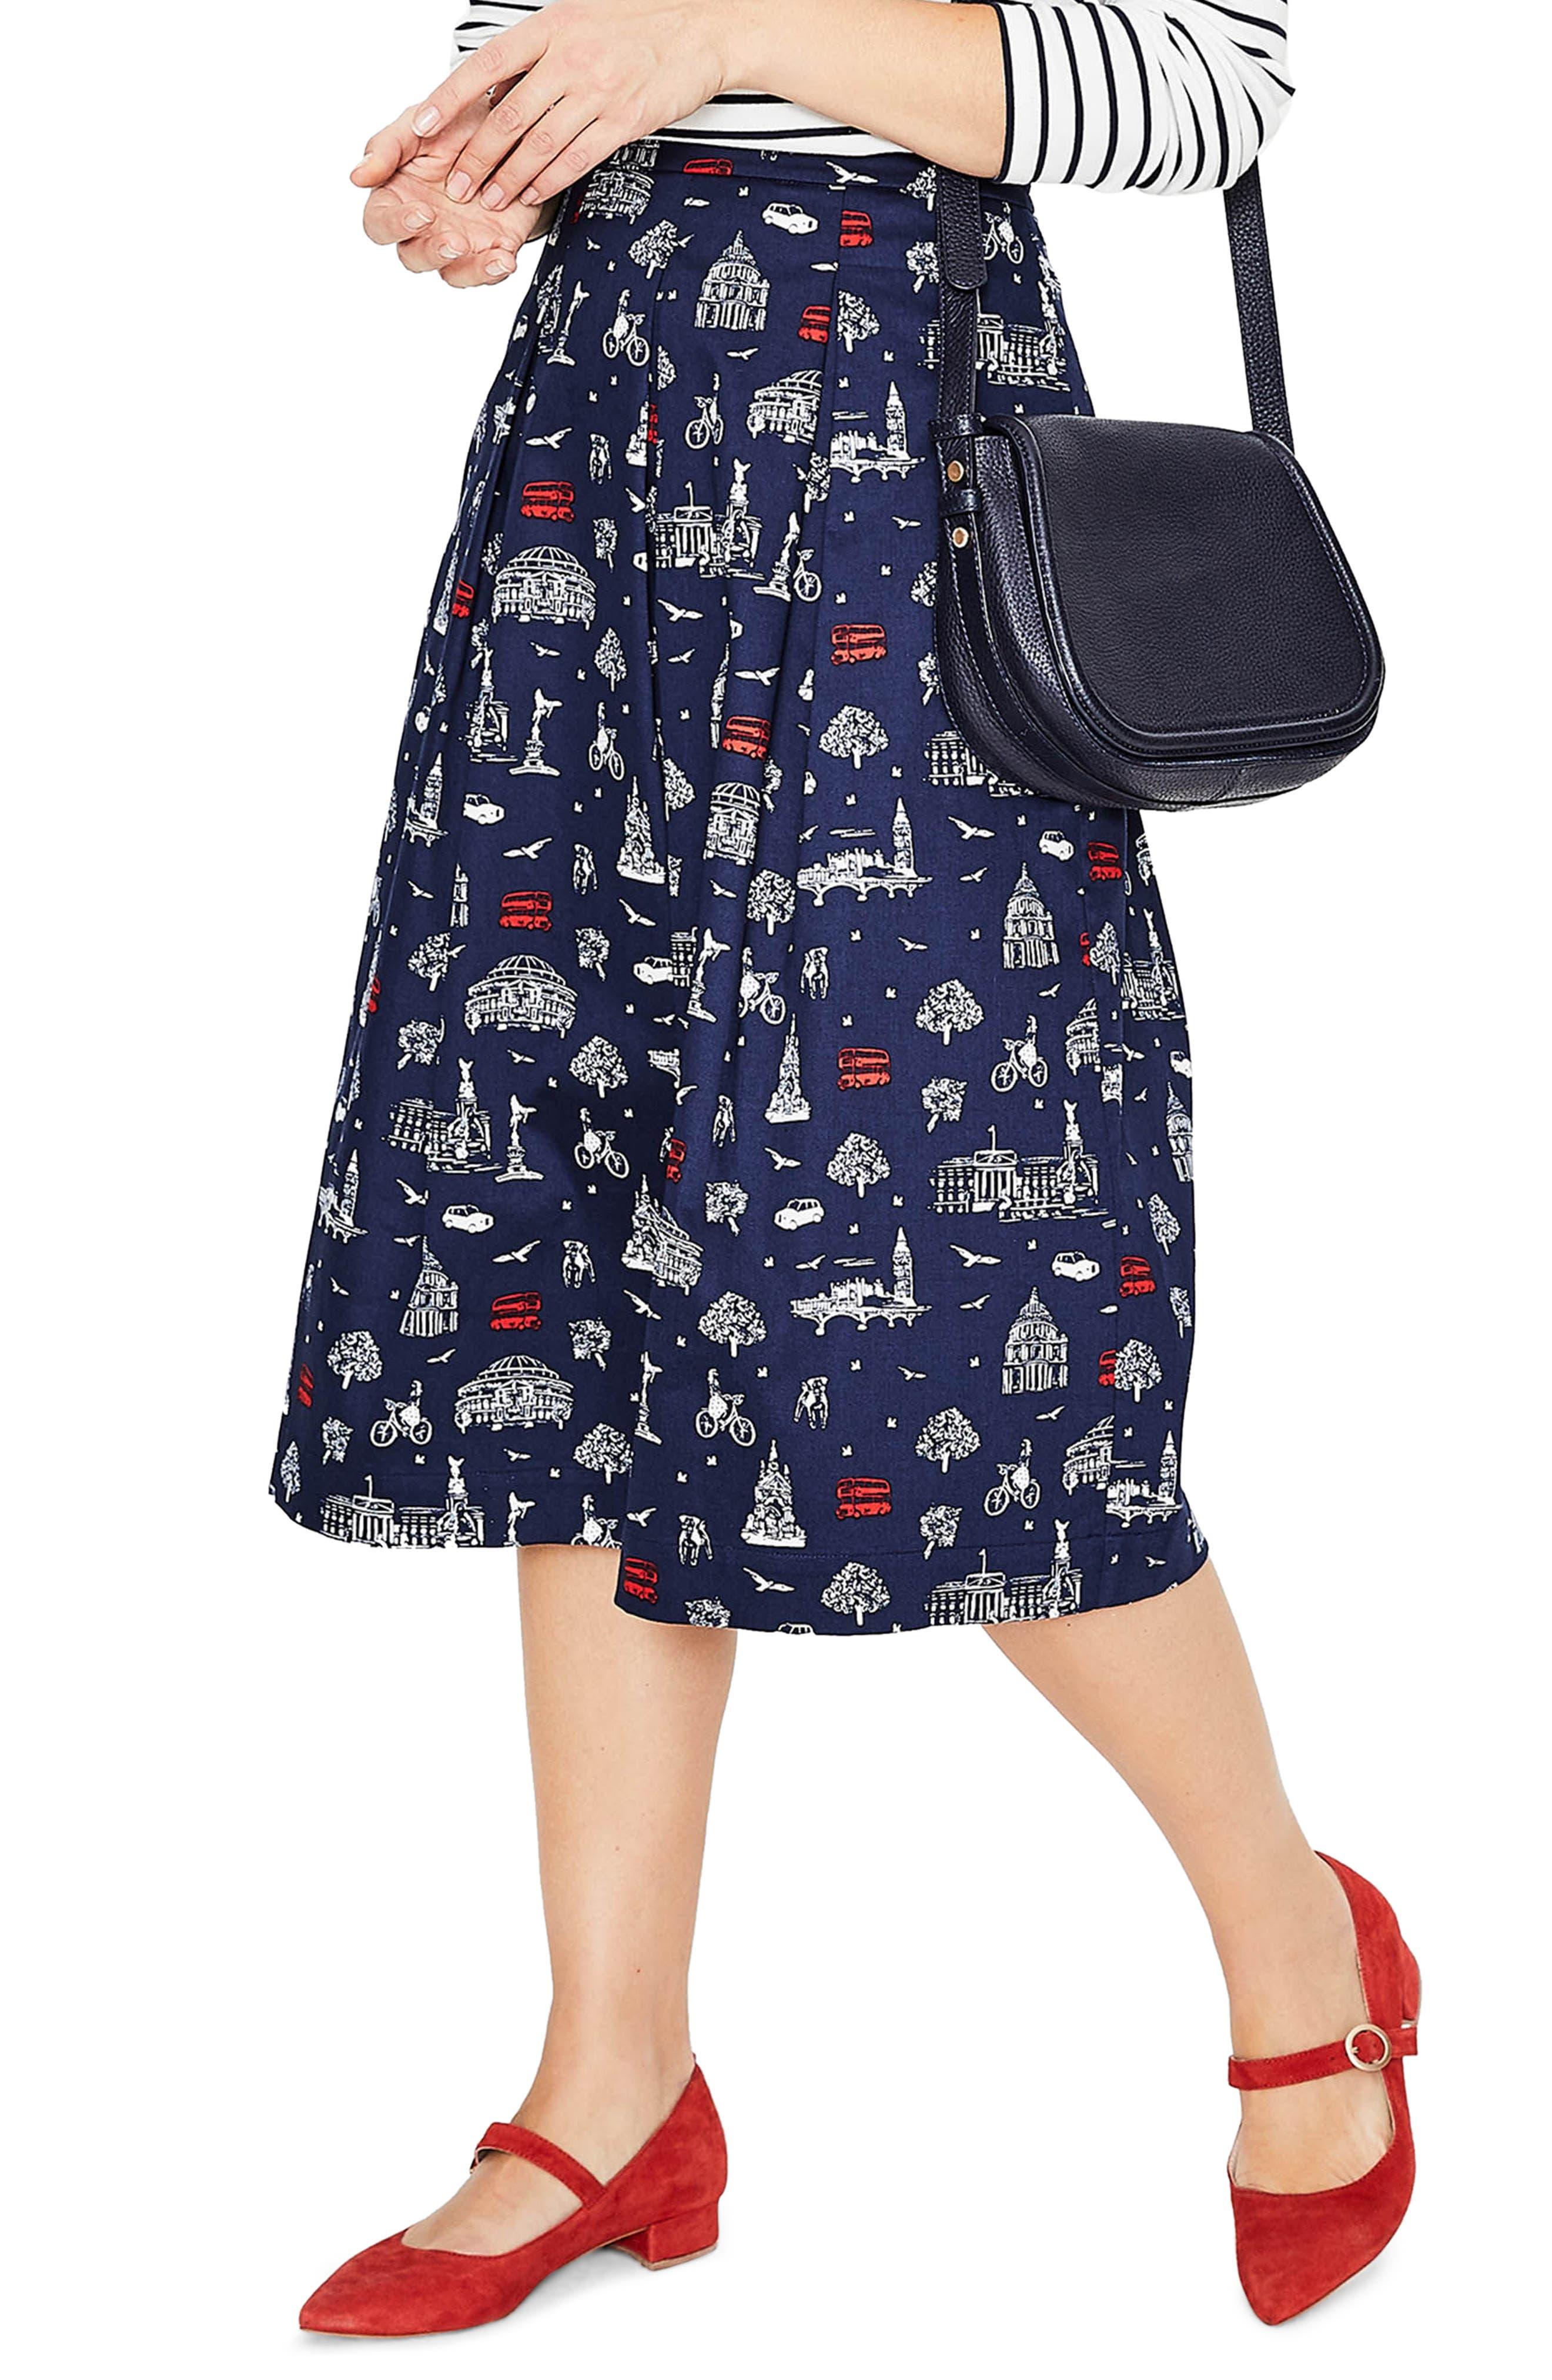 Lola Floral Flared Skirt,                             Alternate thumbnail 13, color,